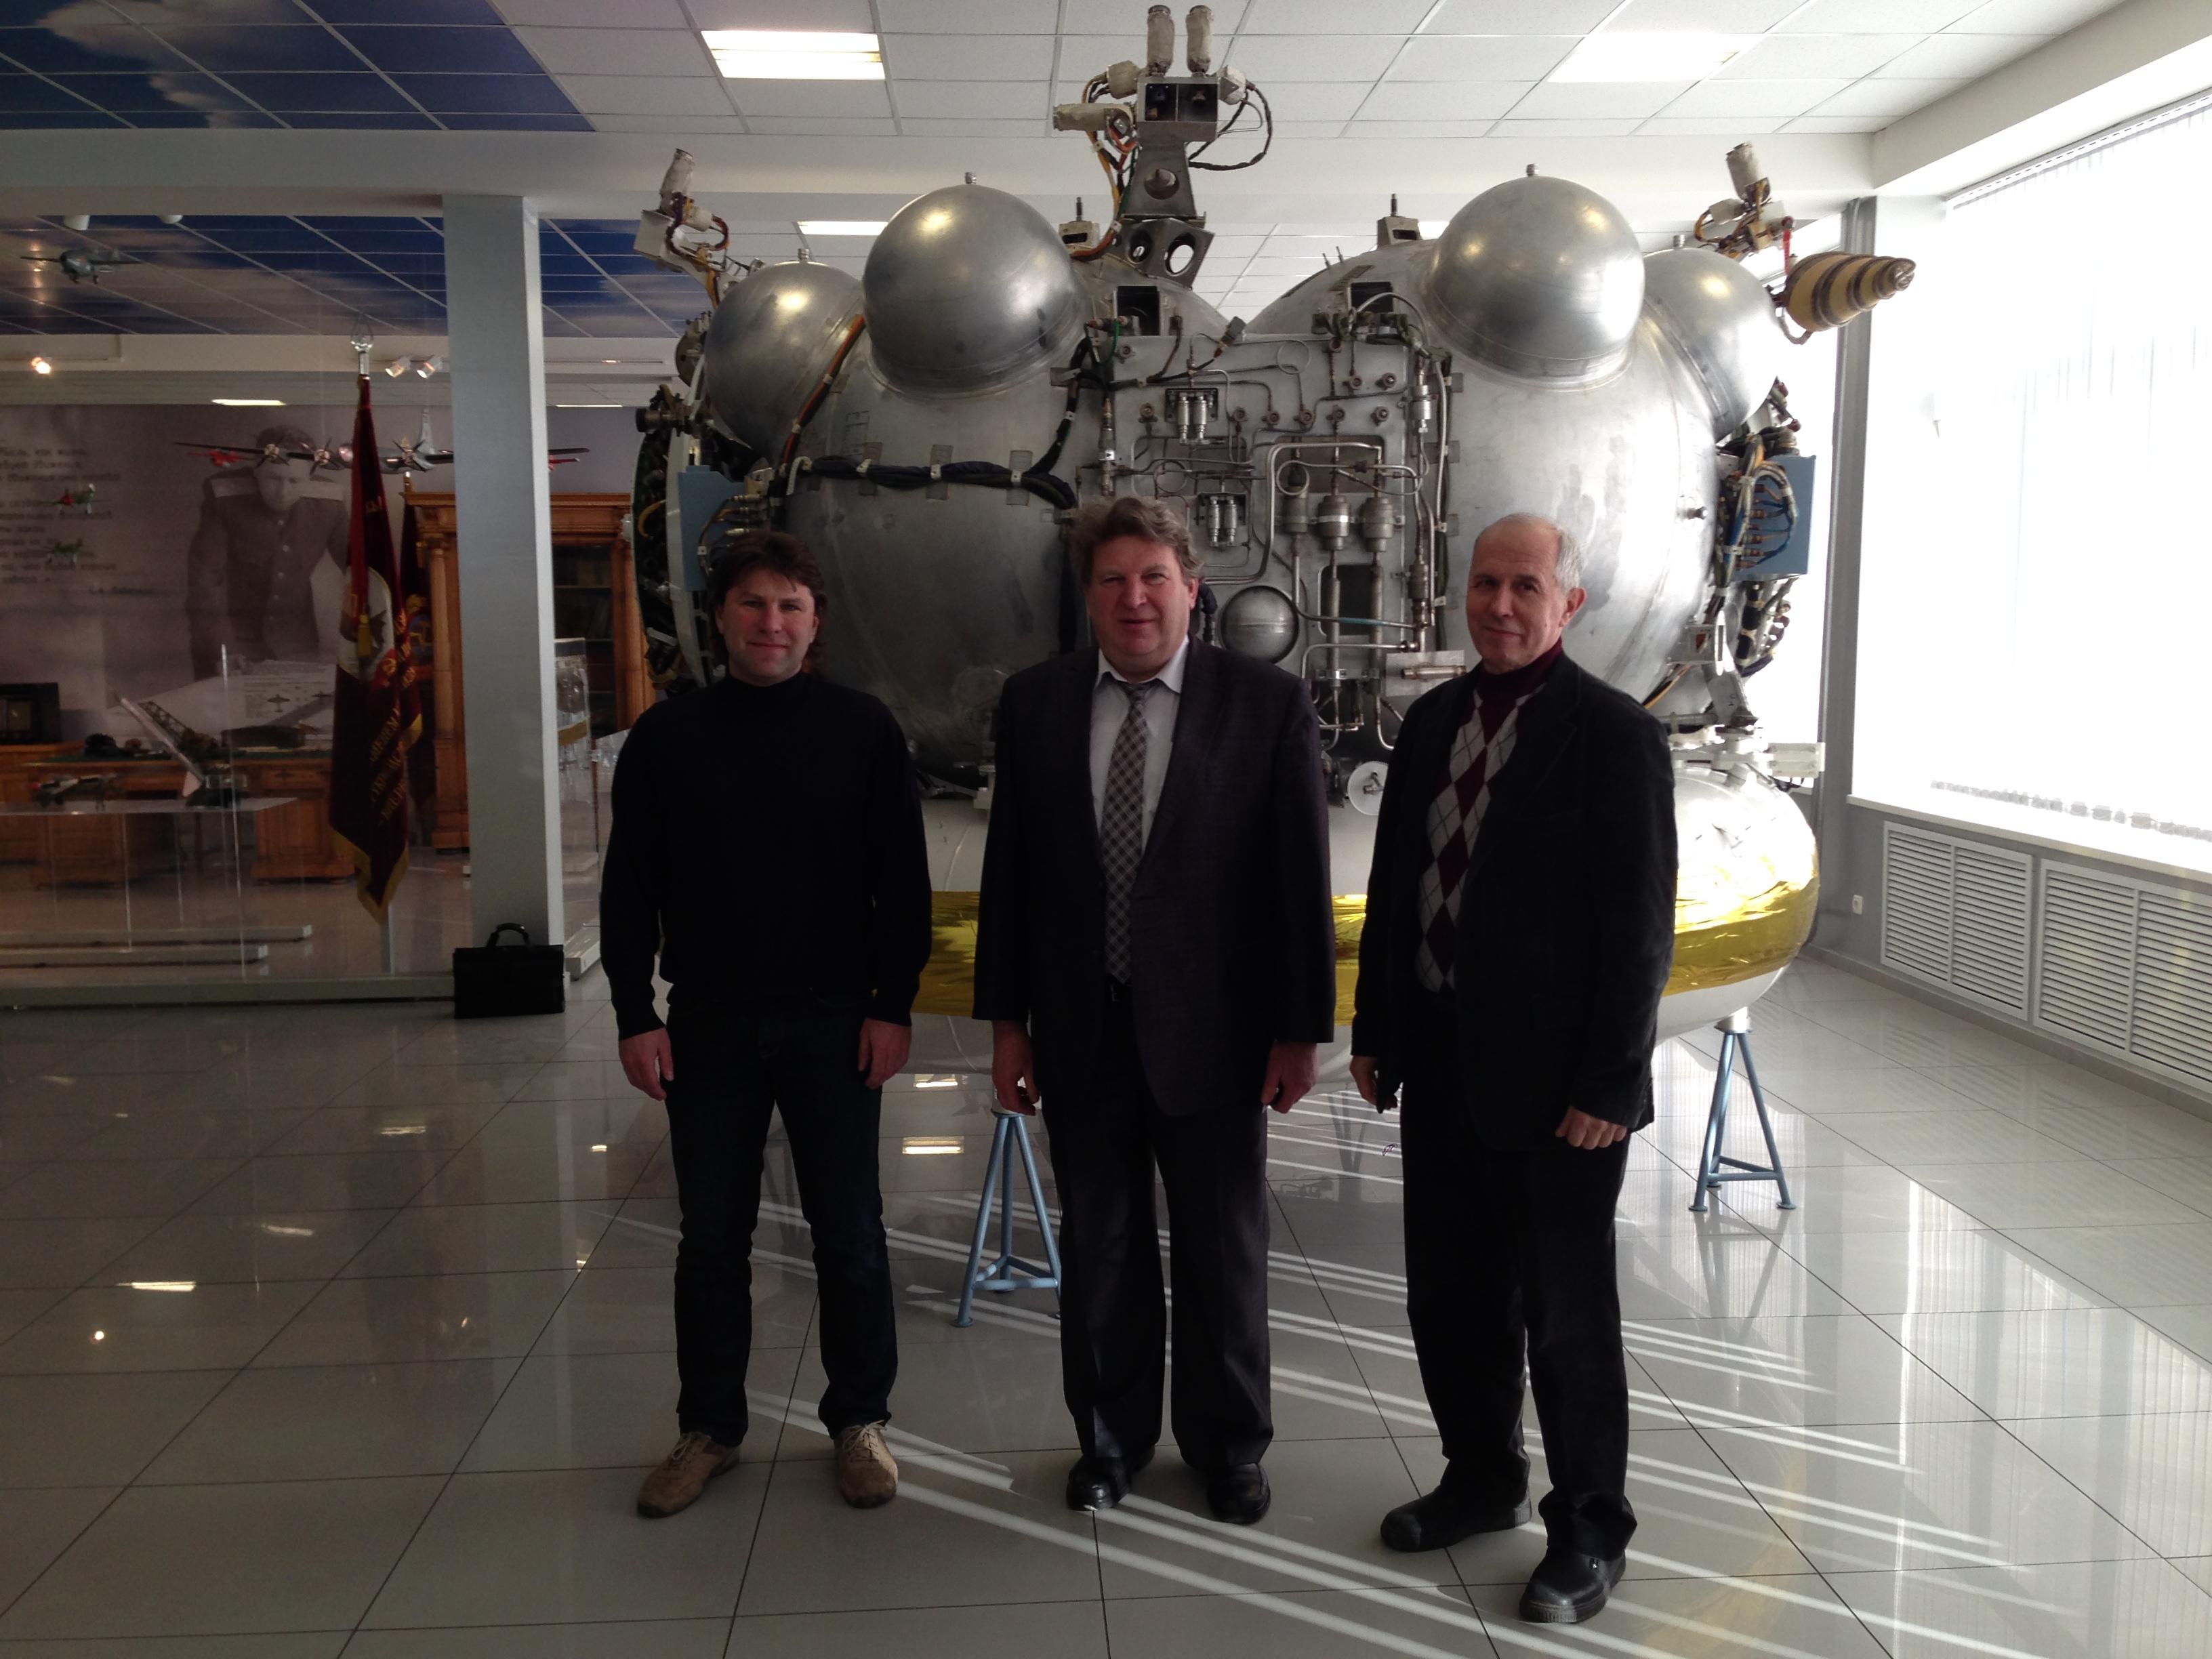 31 января 2014 года. Музей НПО-Л. XXXVIII чтения по космонавтике. БЦ ИПМ на фоне Фрегат-СБ